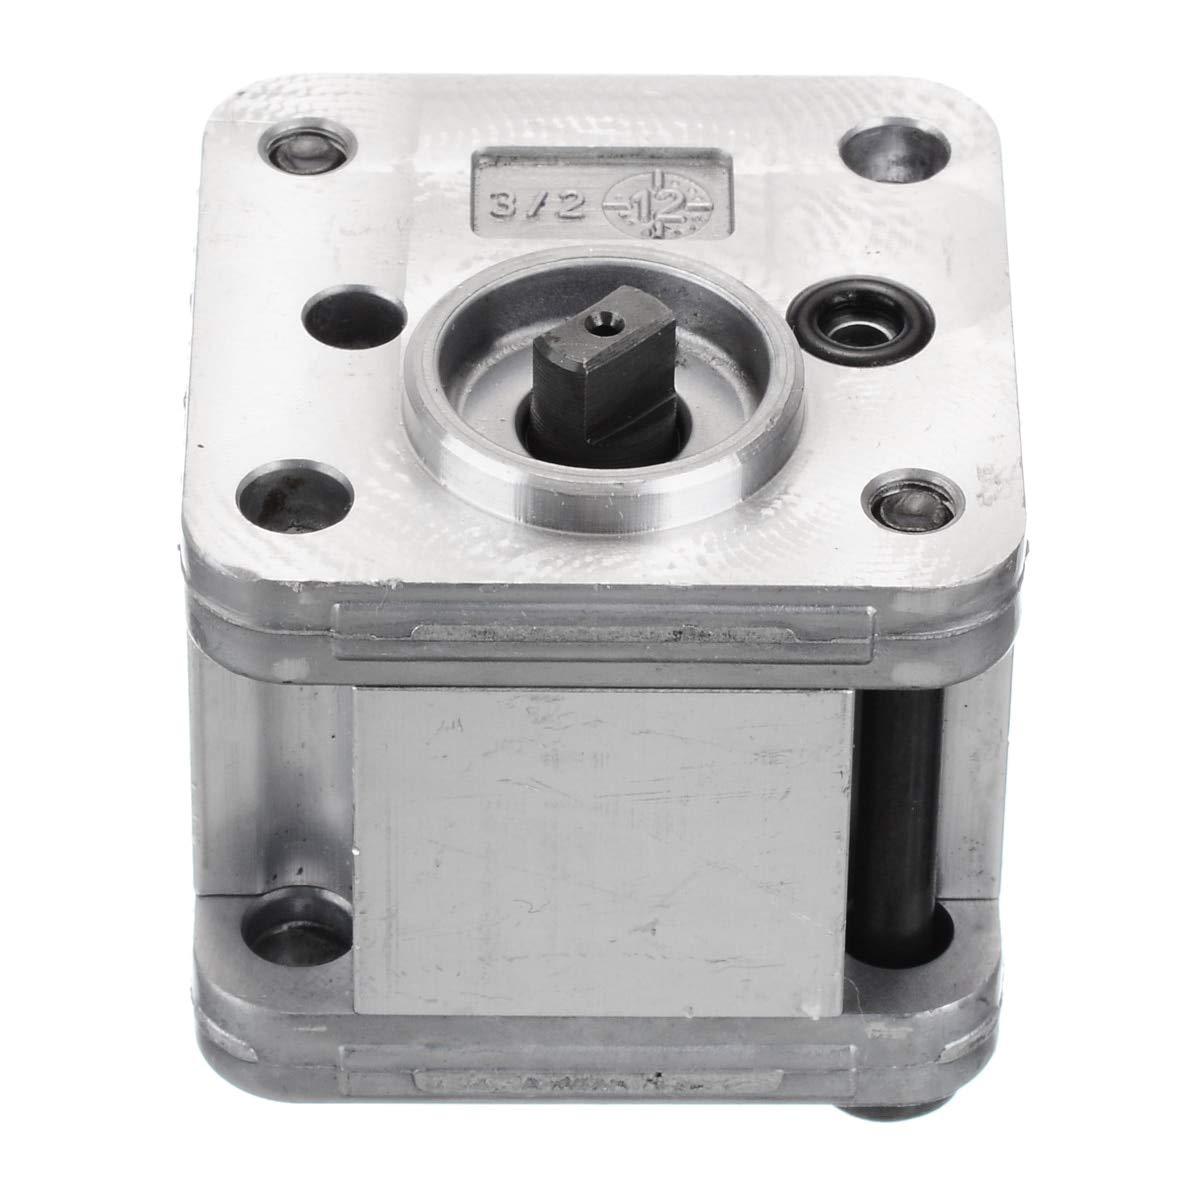 New 1pcs Hydraulic Gear Pump Metal Gear Pump Hydraulic Model Excavating Machinery for Home Tools